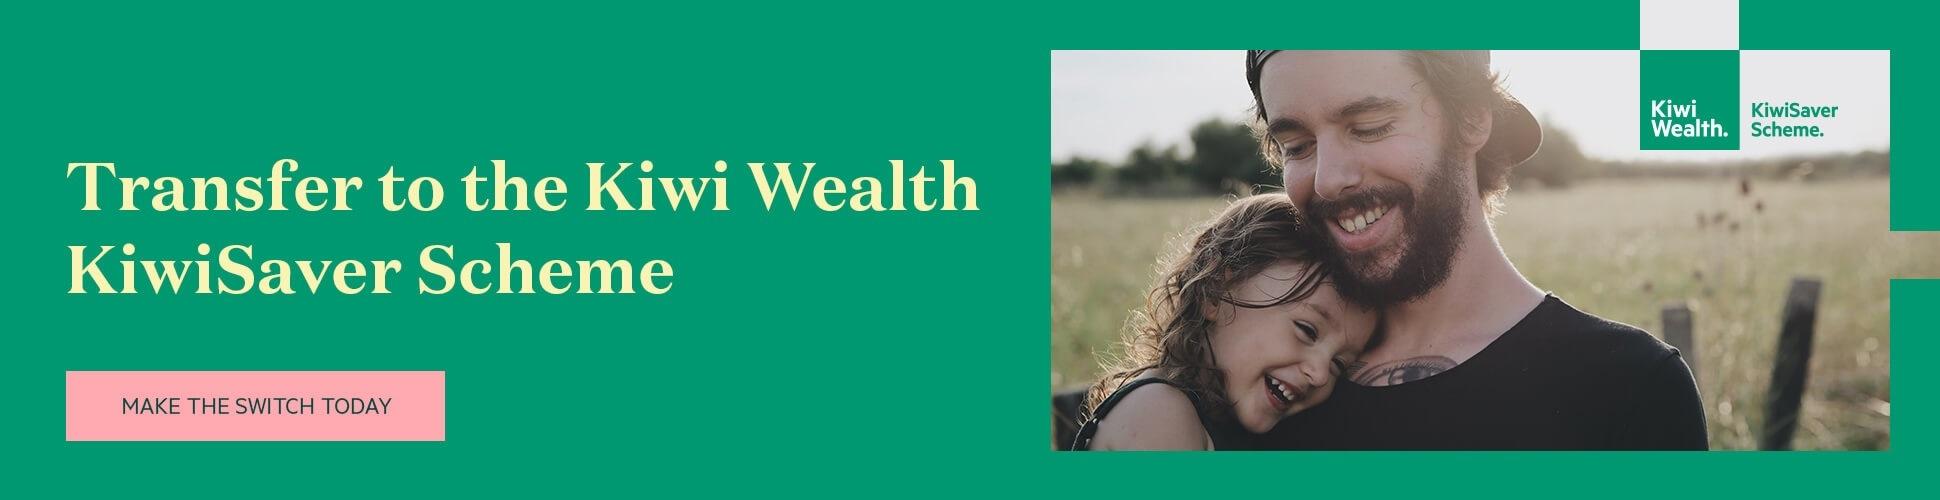 kiwi wealth kiwisaver product banner - landscape